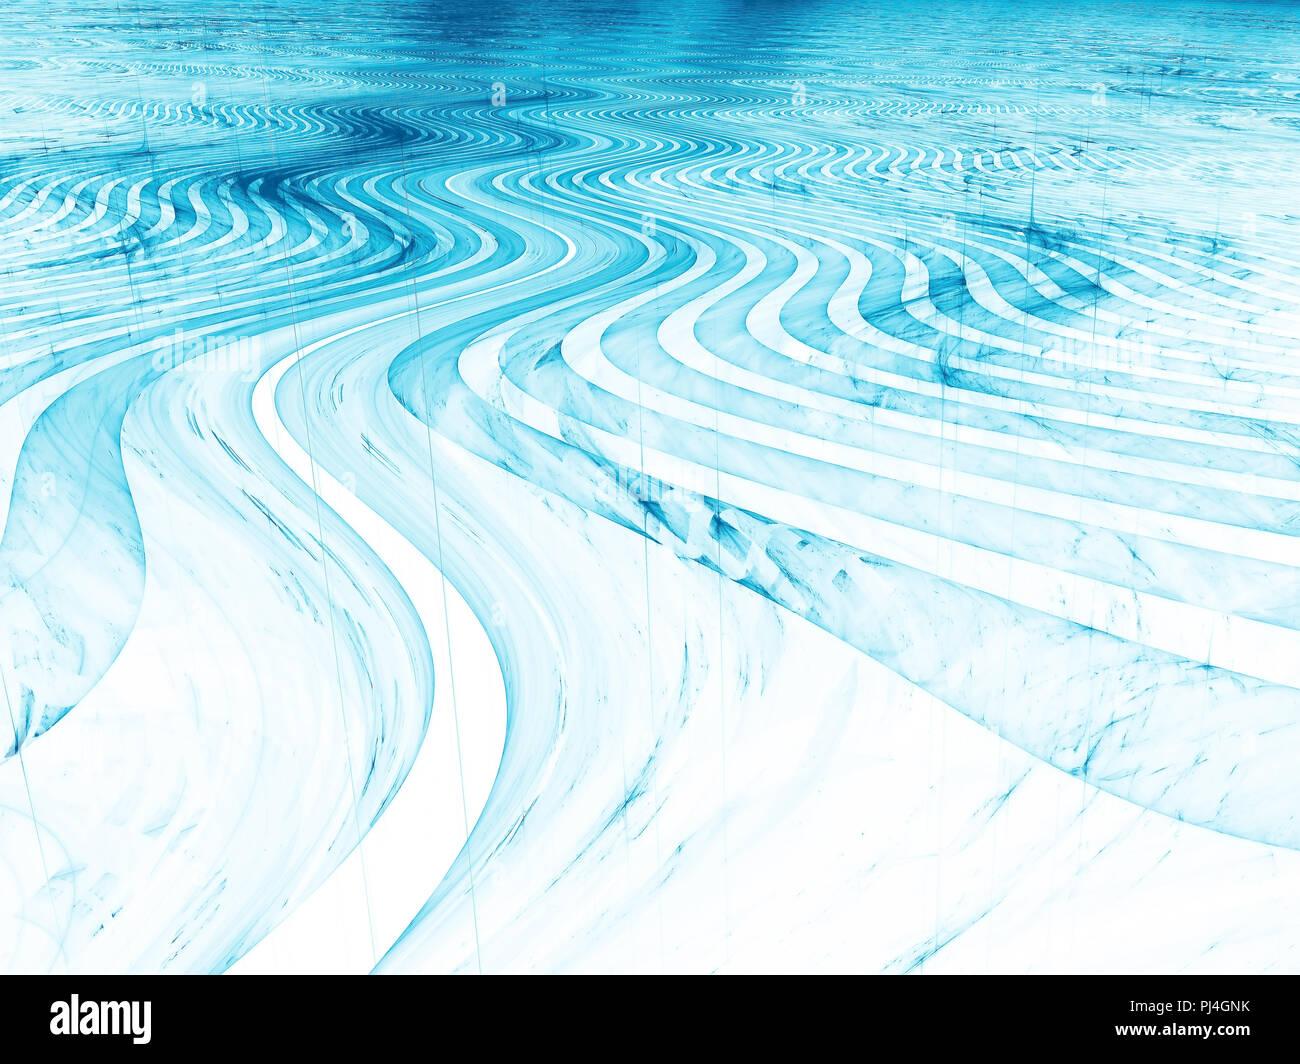 Glossy wavy surface - abstract digitally generated image Stock Photo